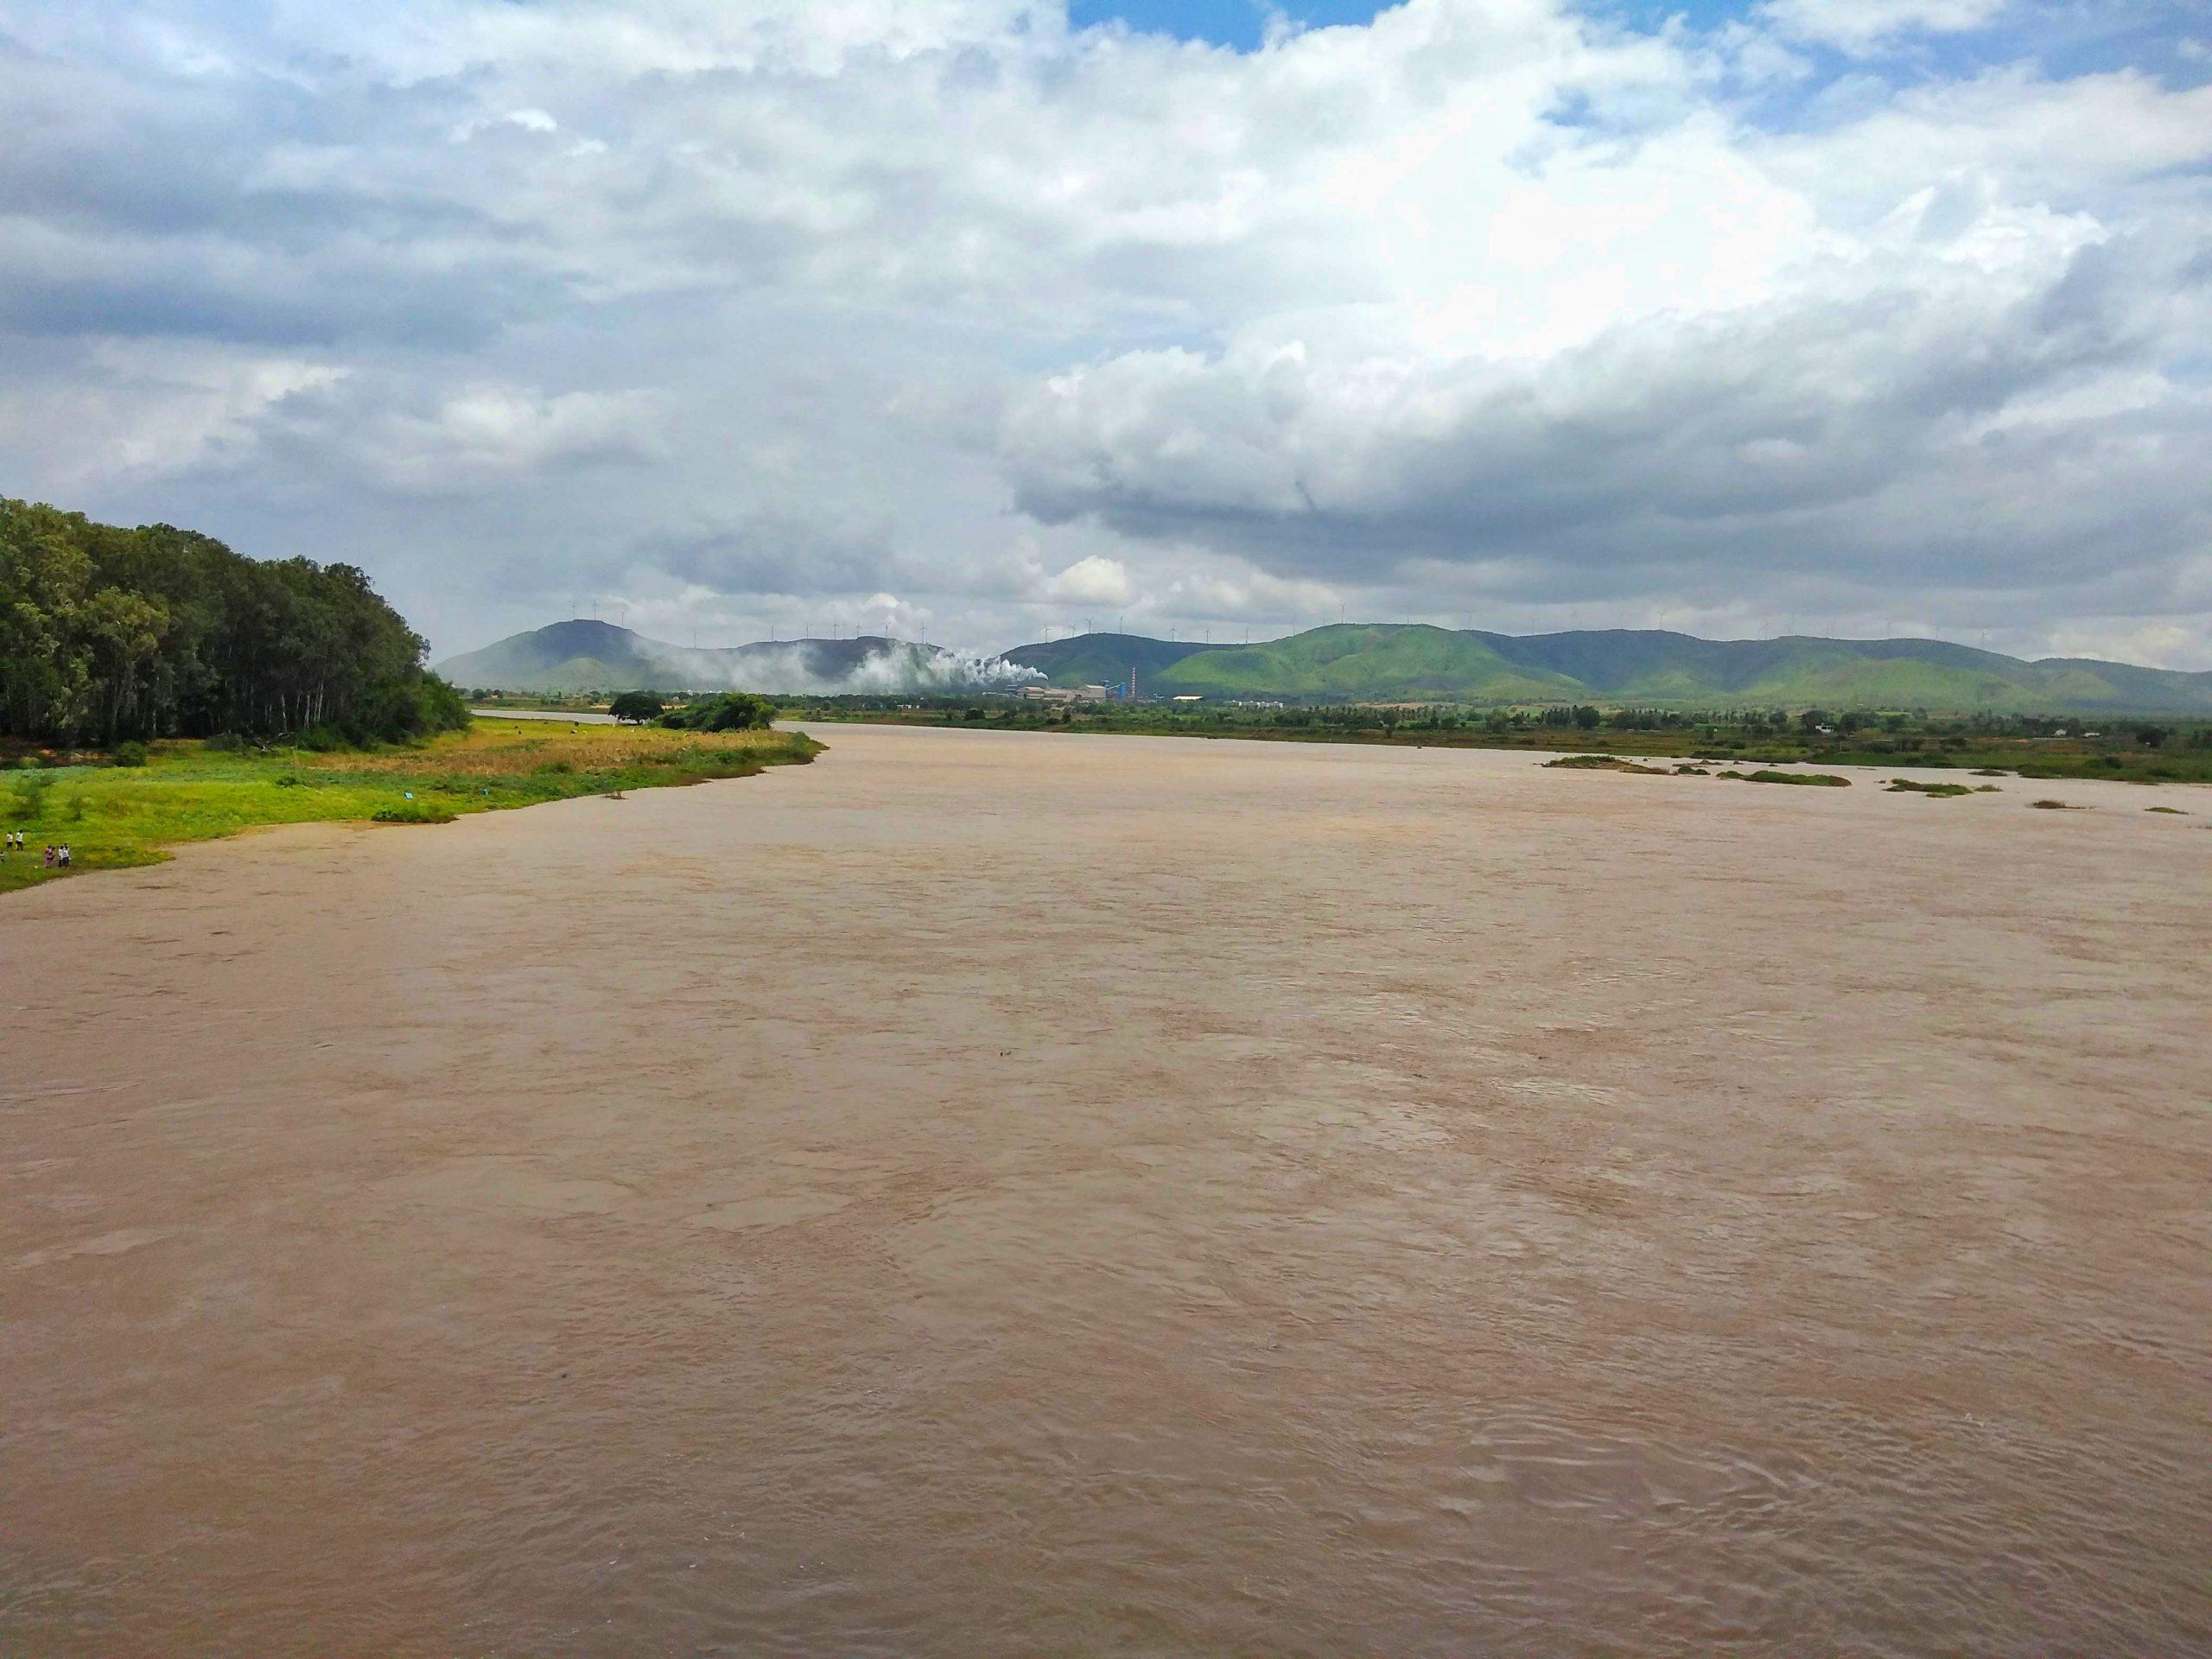 Tungbhadra river